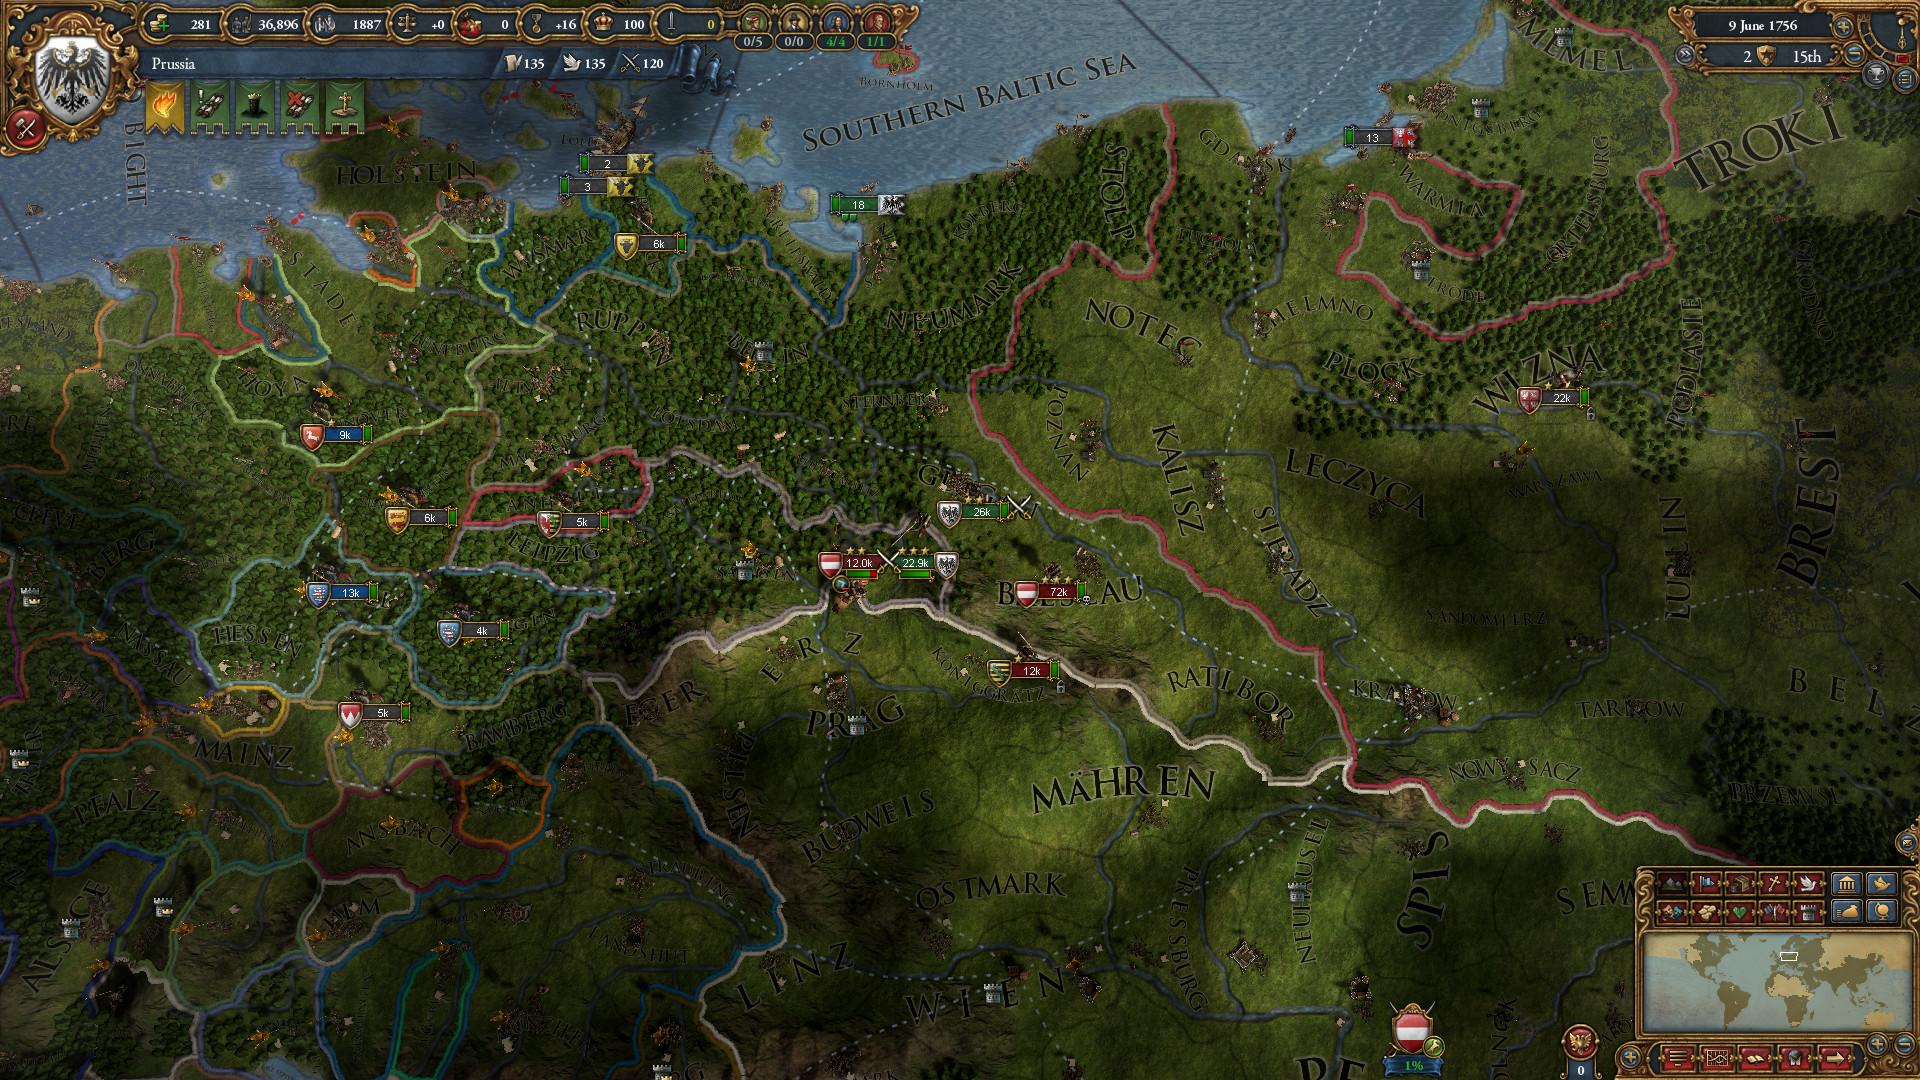 Europa Universalis 4 Preußen